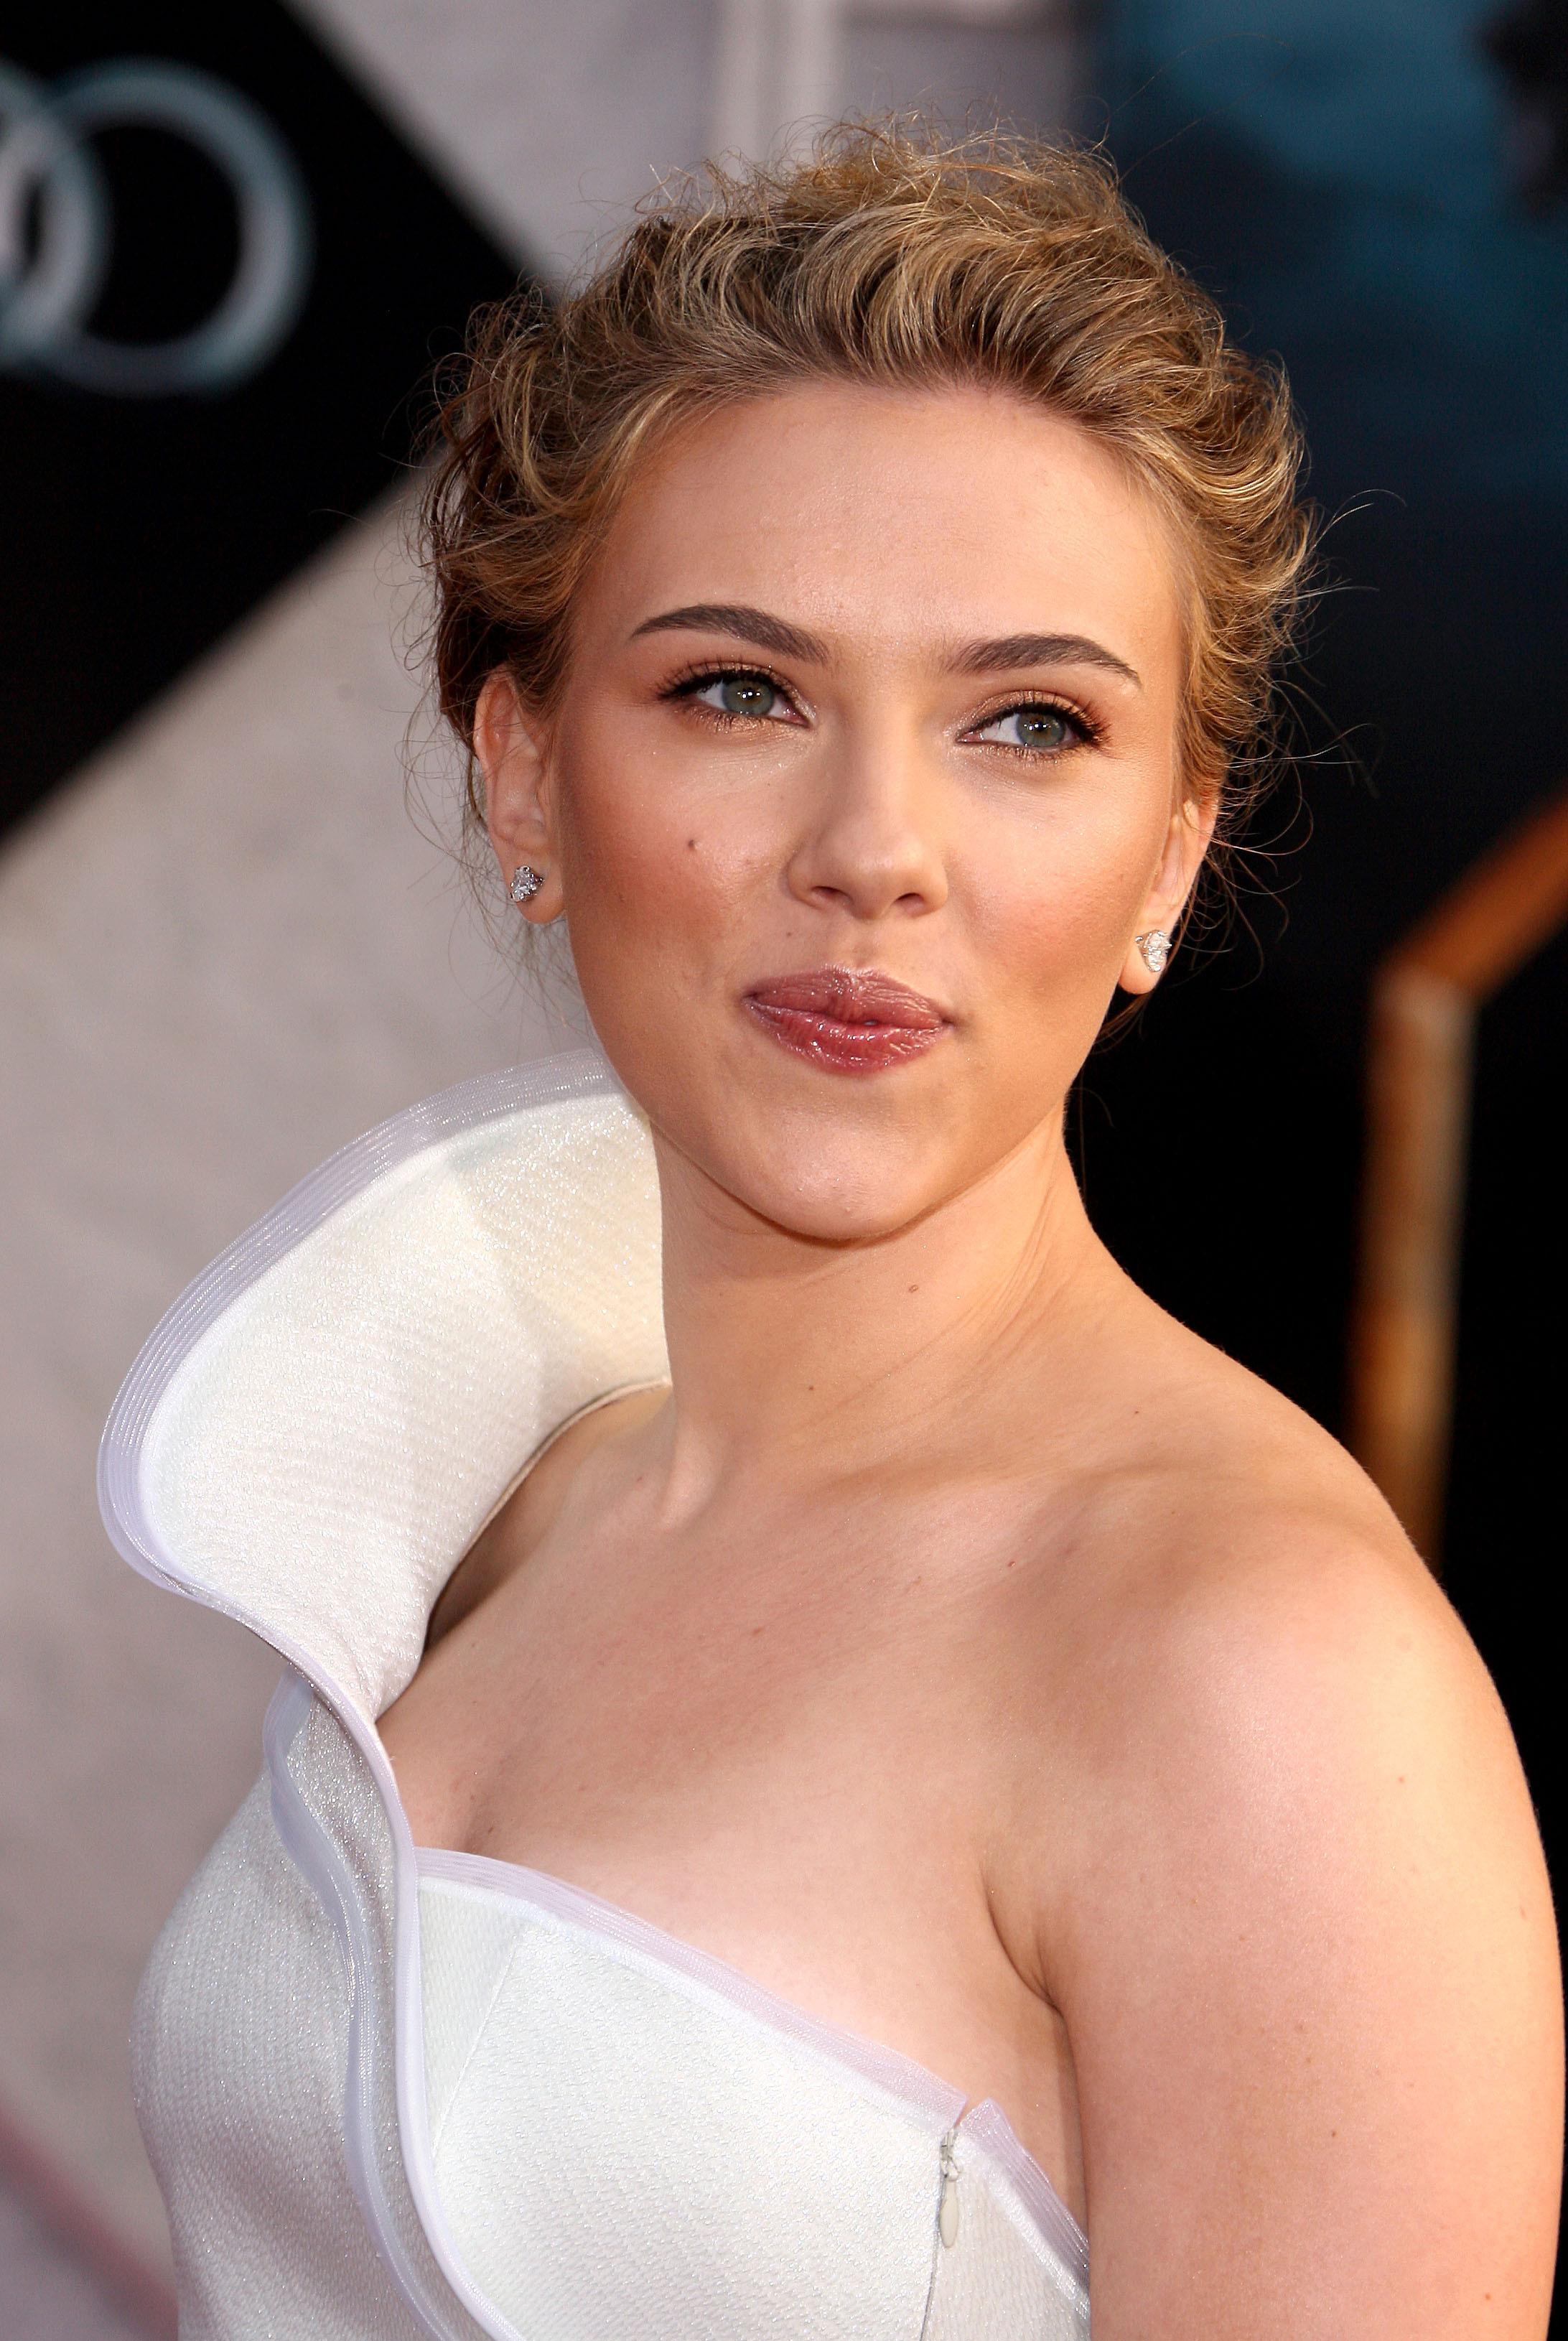 50684_celebrity_paradise.com_Scarlett_Johansson_Iron_Man_2_World_Premiere_in_Hollywood_26.04.2010_09_122_786lo.jpg